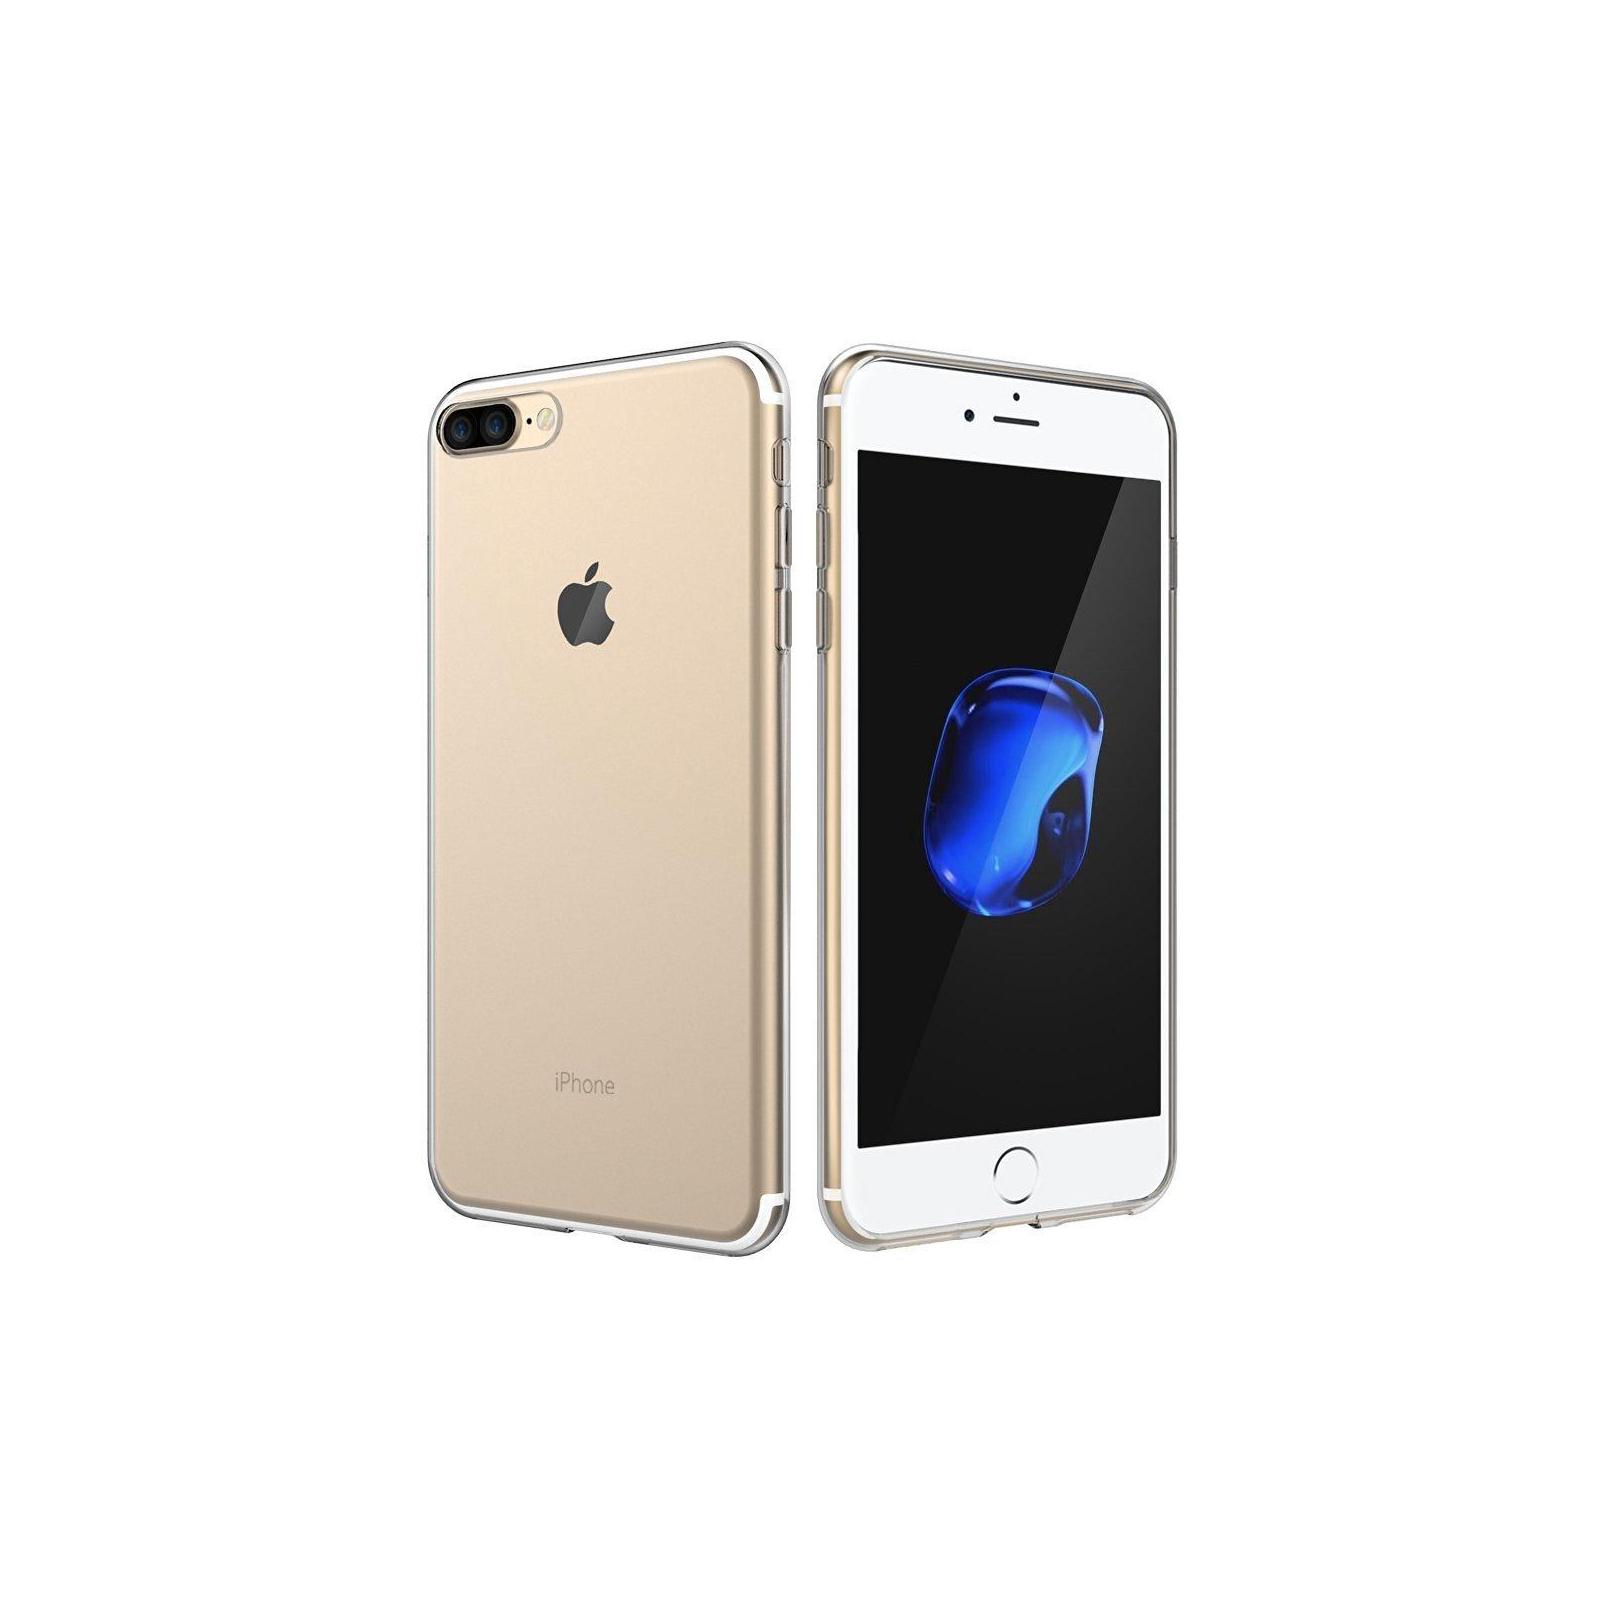 Чехол для моб. телефона Laudtec для iPhone 7/8 Plus Clear tpu (Transperent) (LC-IP78PST) изображение 2